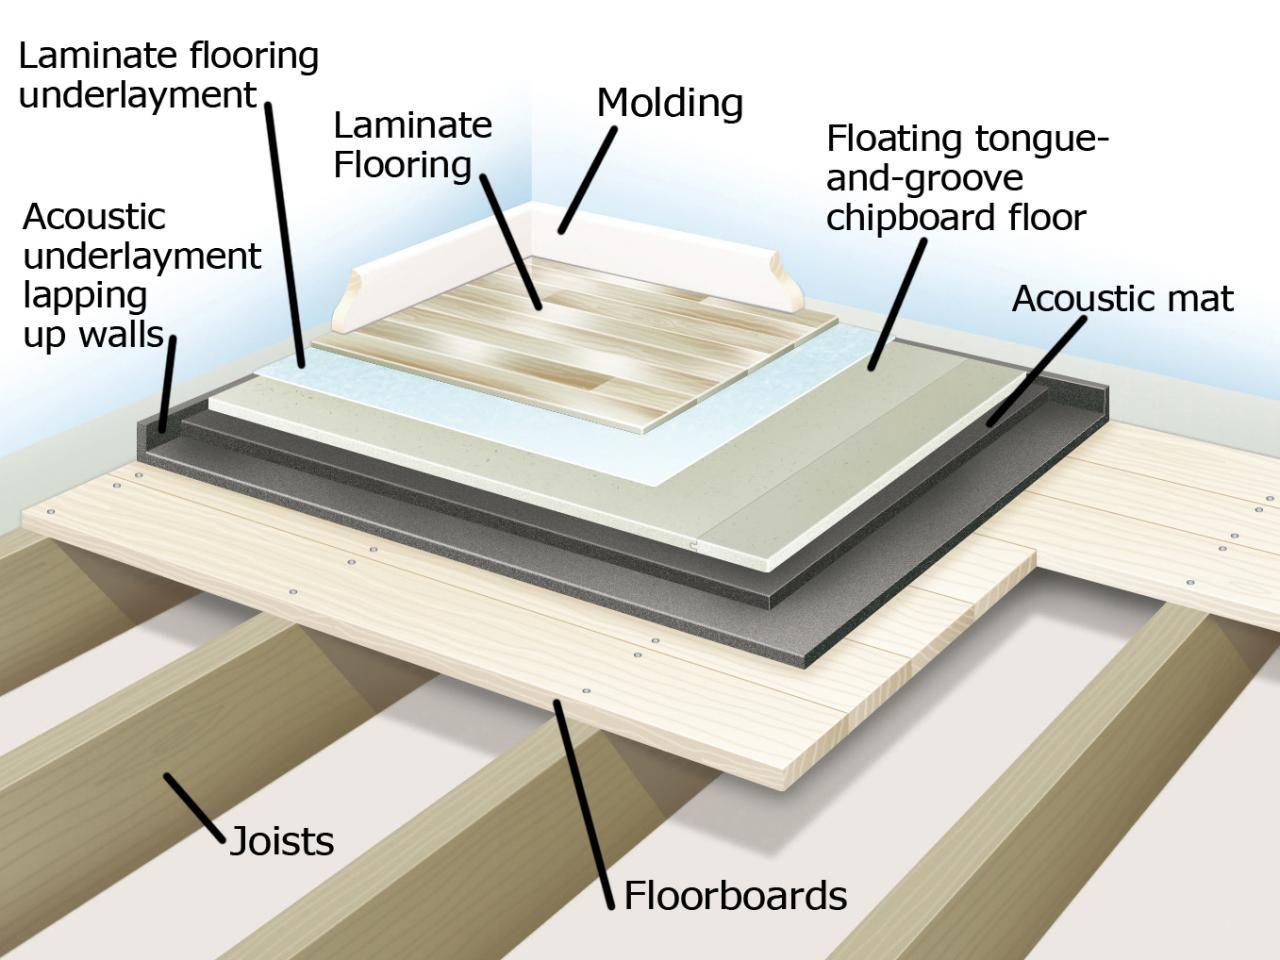 isolamento acústico piso flutuante